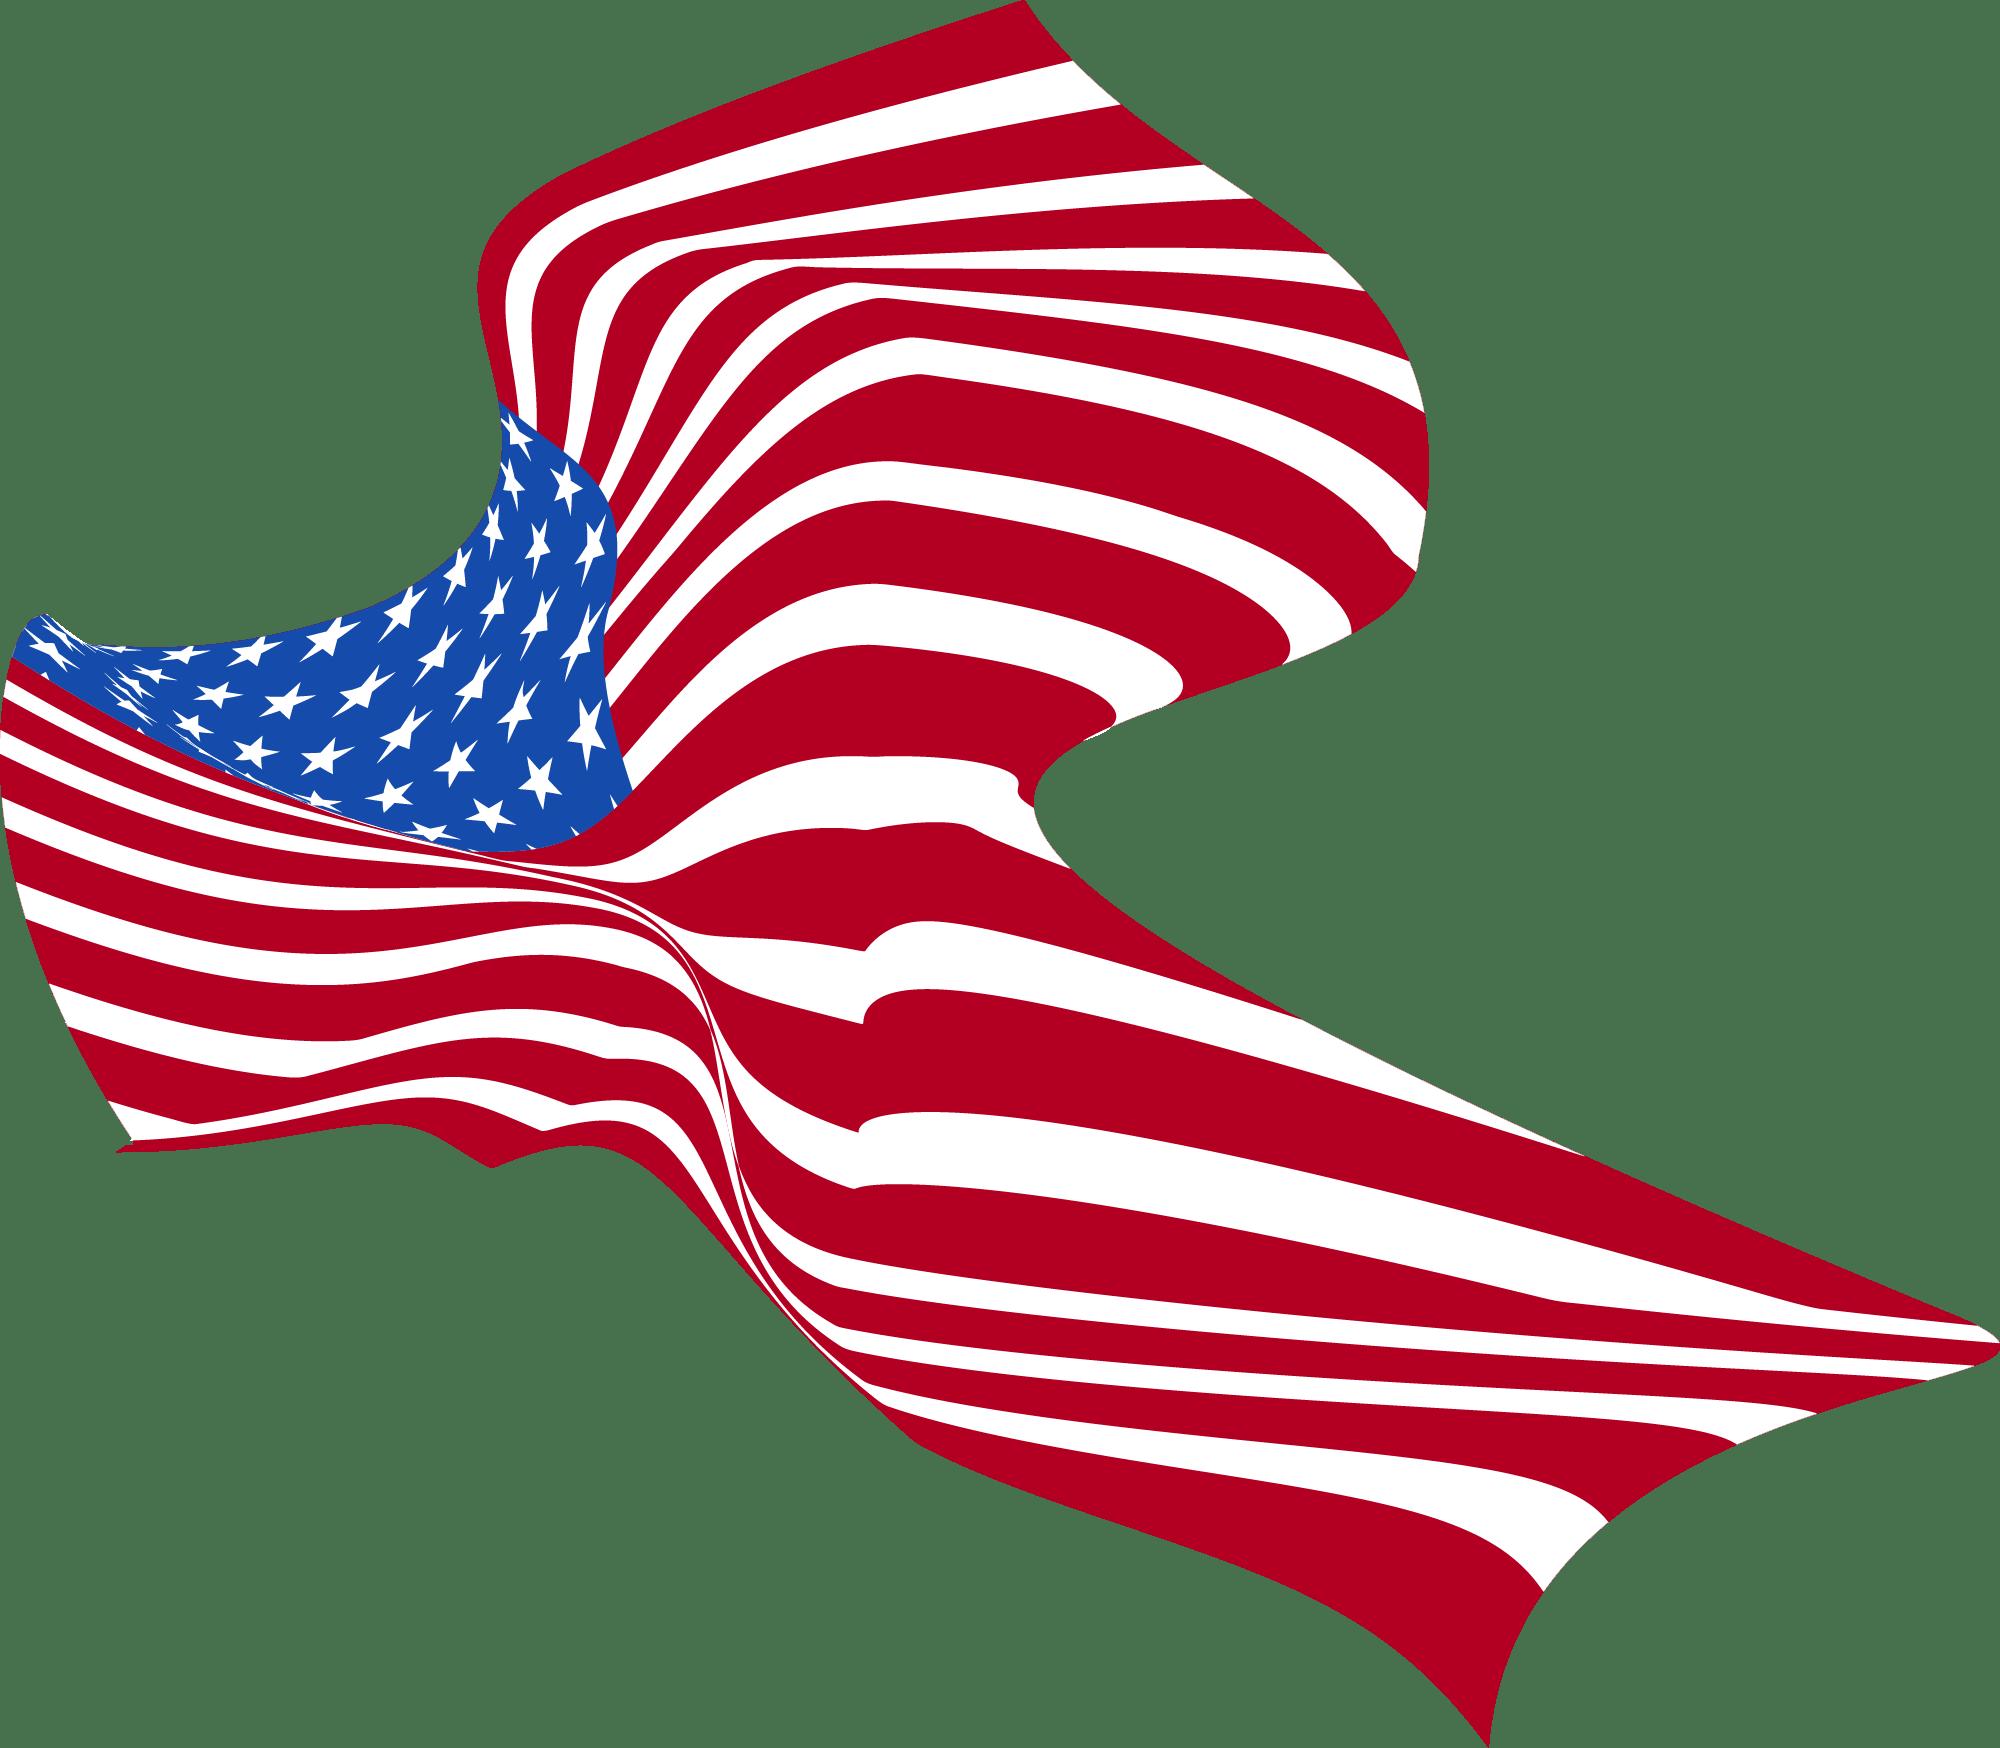 USA-Flag-Decal-Clipart